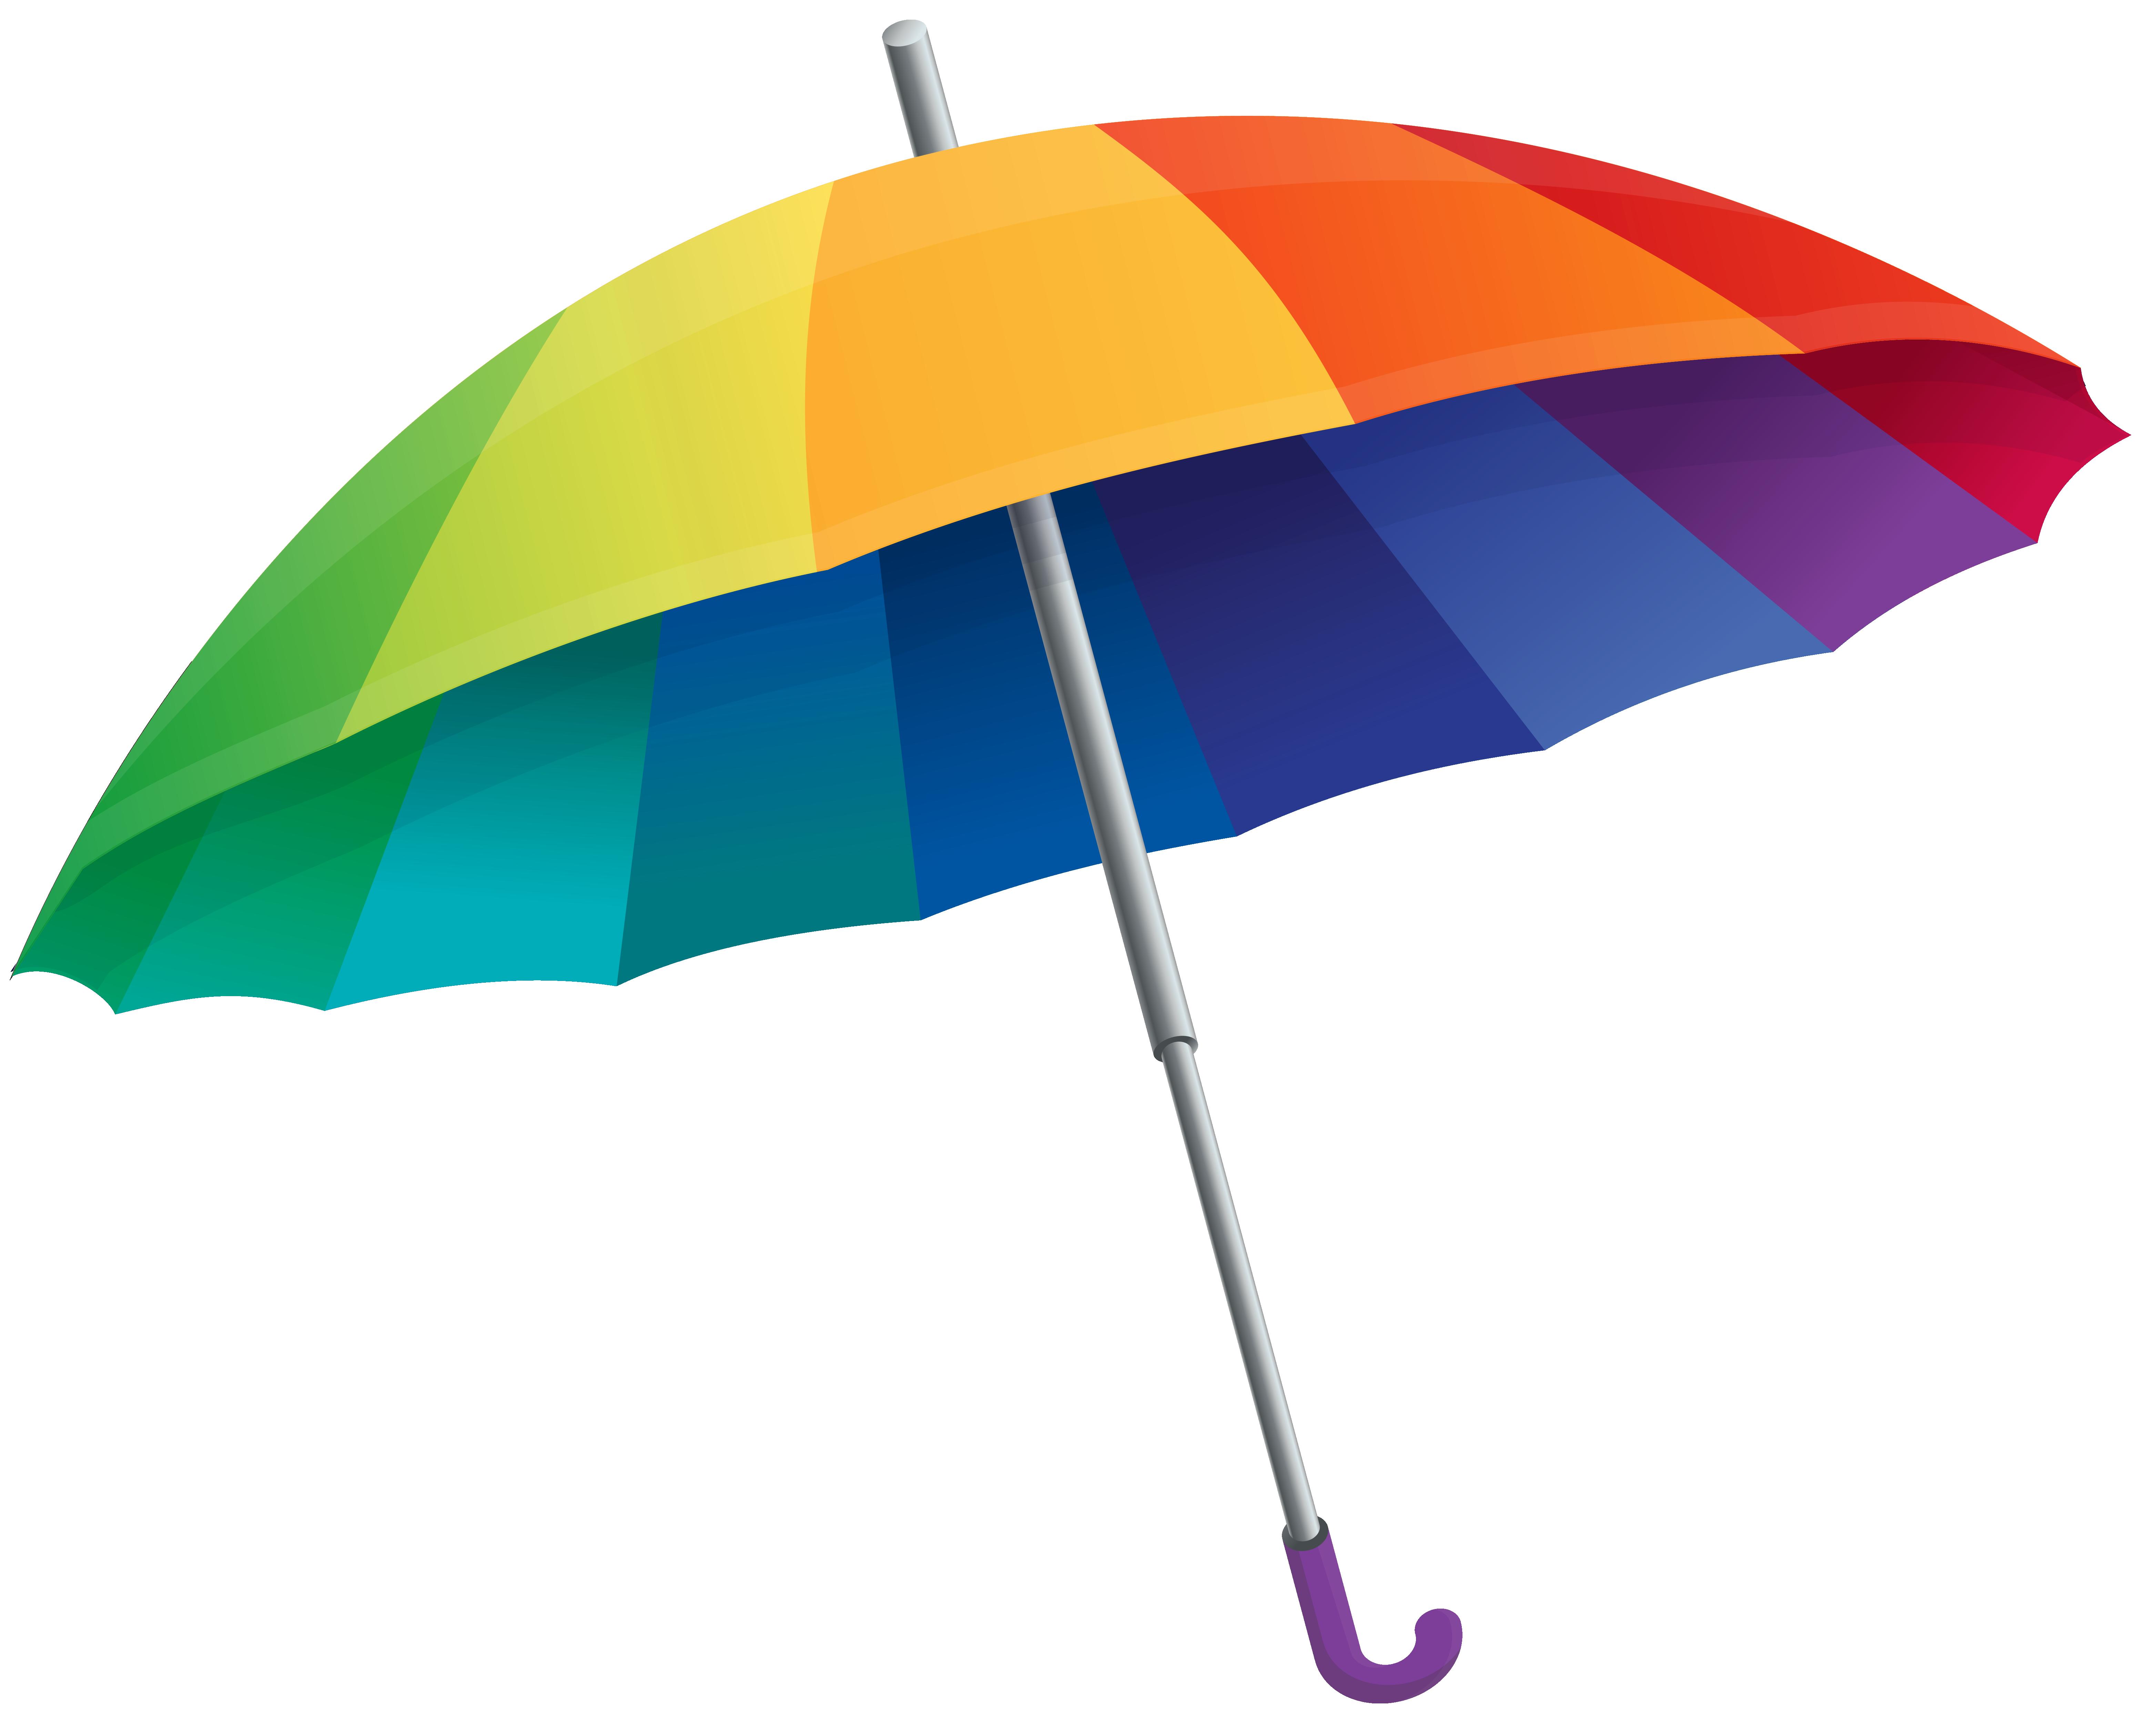 6255x4964 Rainbow Umbrella PNG Clipart Imageu200b Gallery Yopriceville